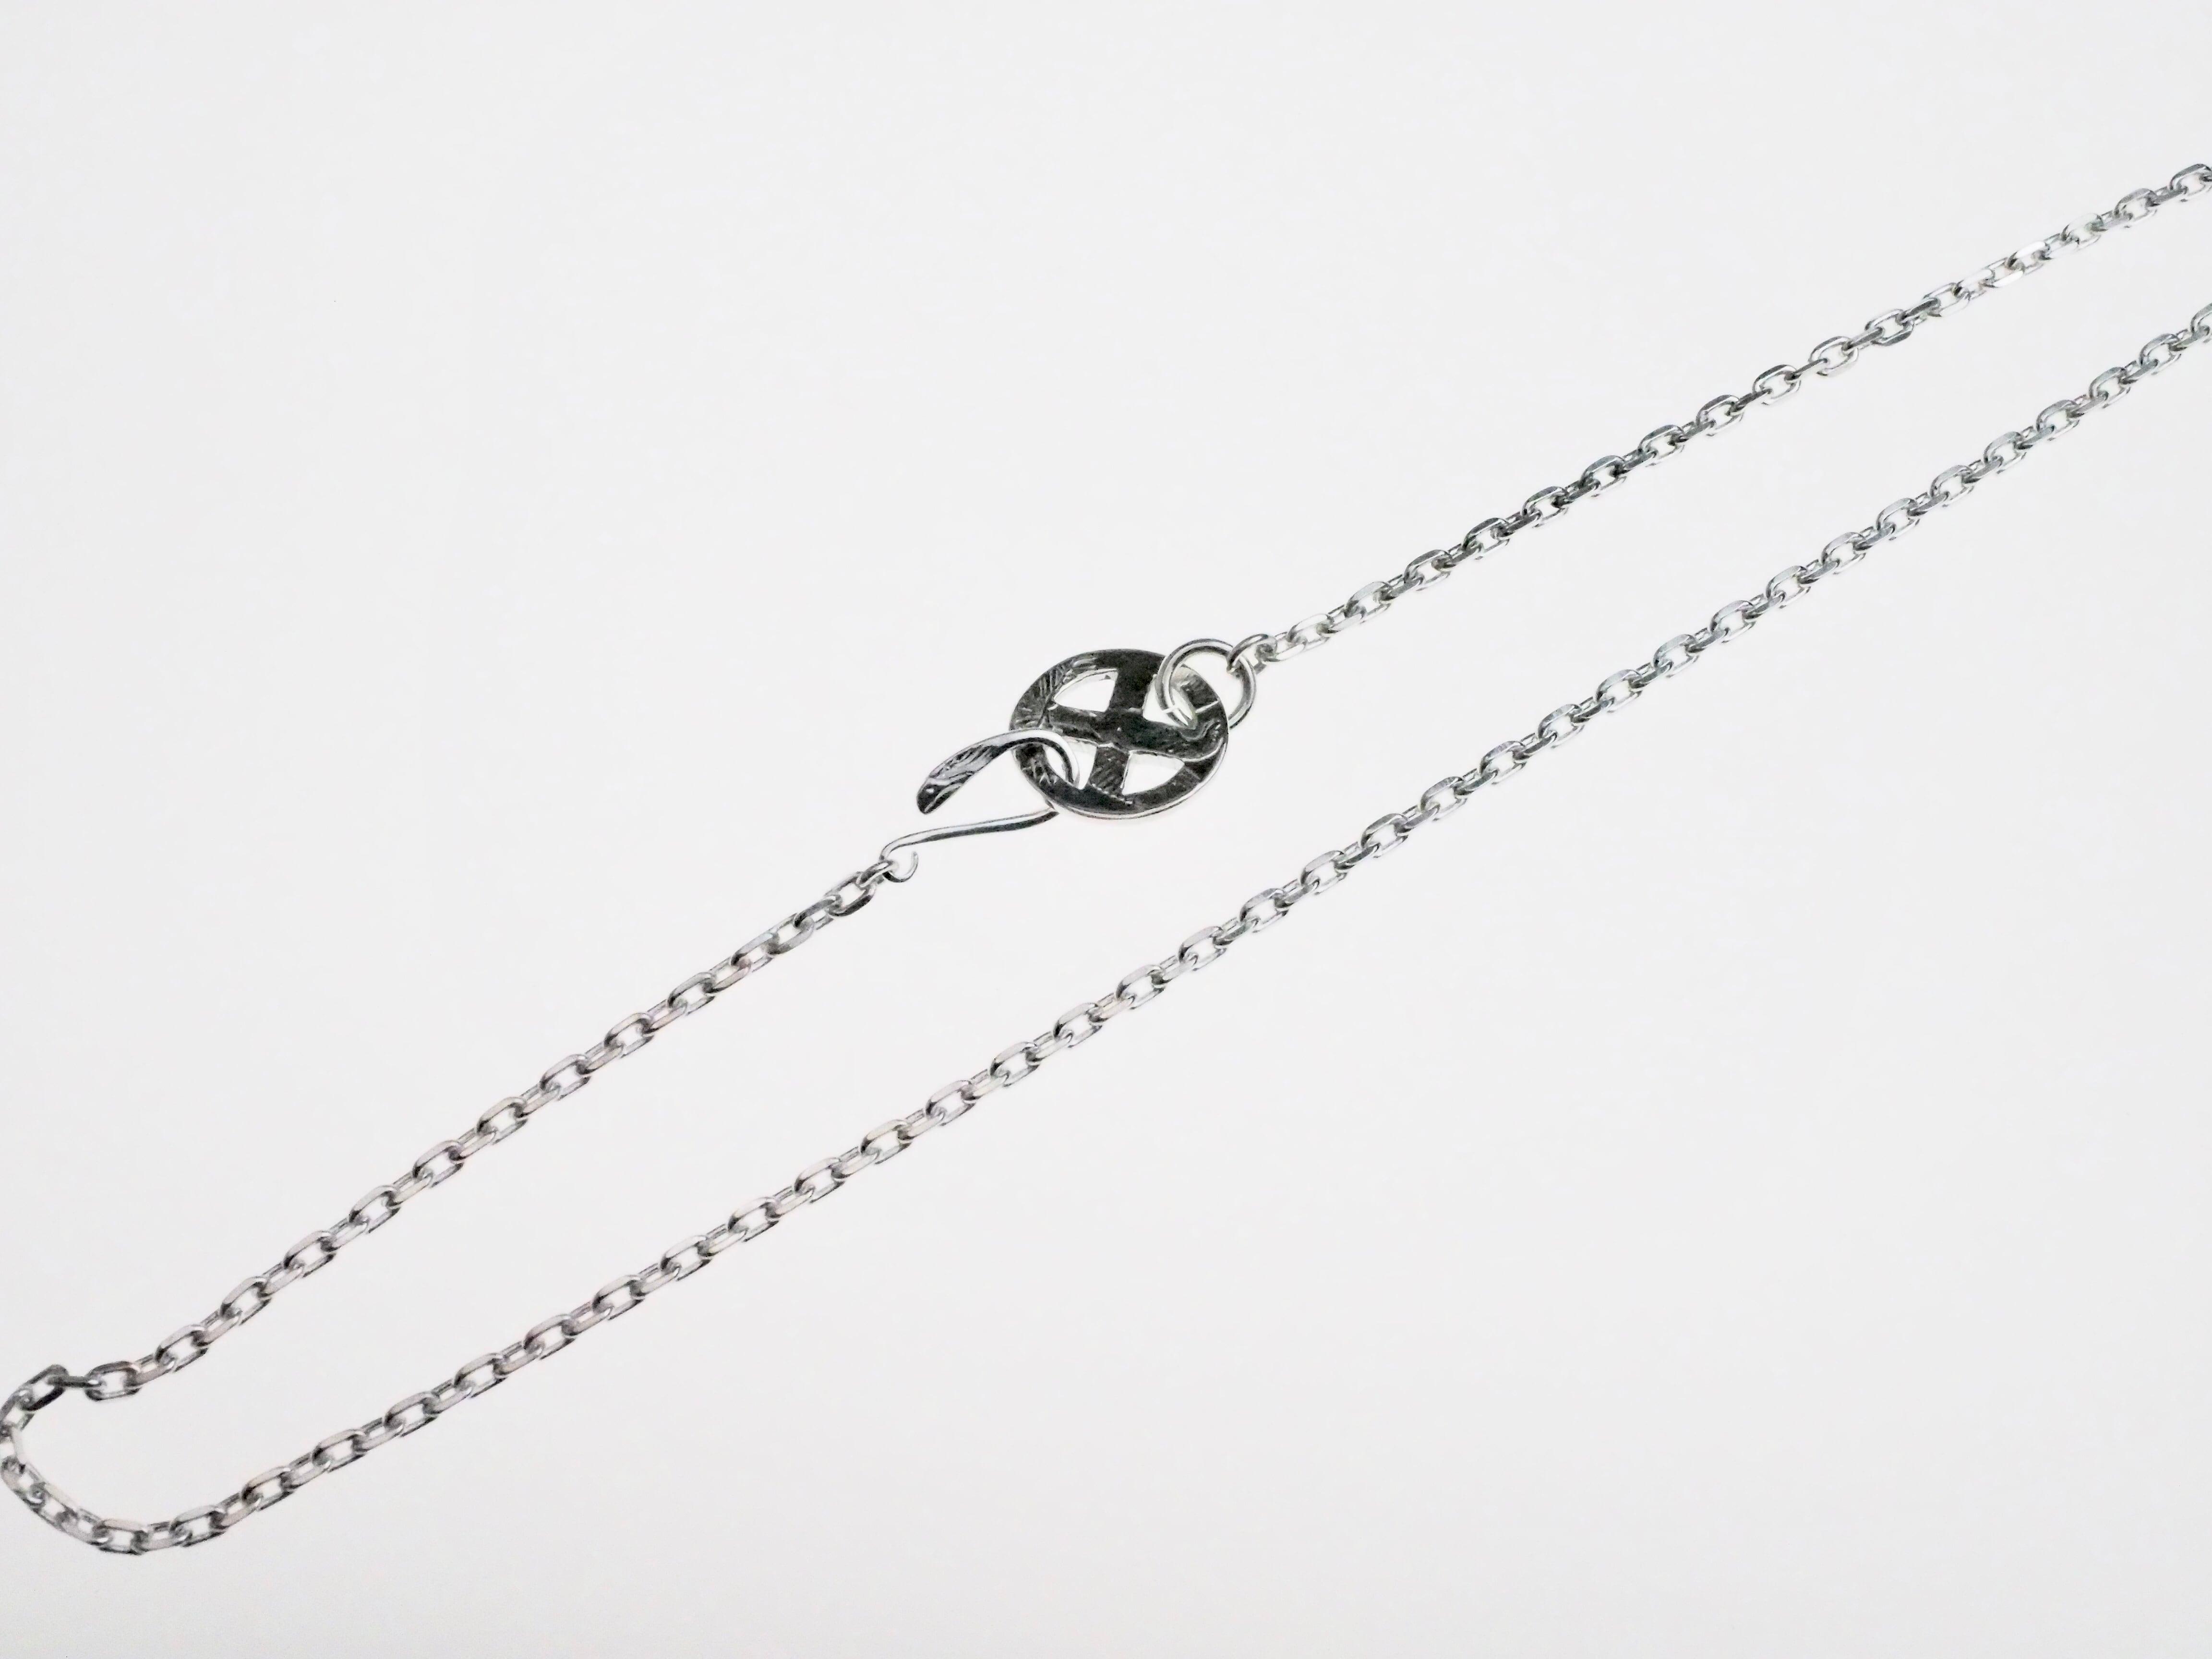 C-009 chain L 50cm ( Square) +Eagle Hook +Morgan Wheel